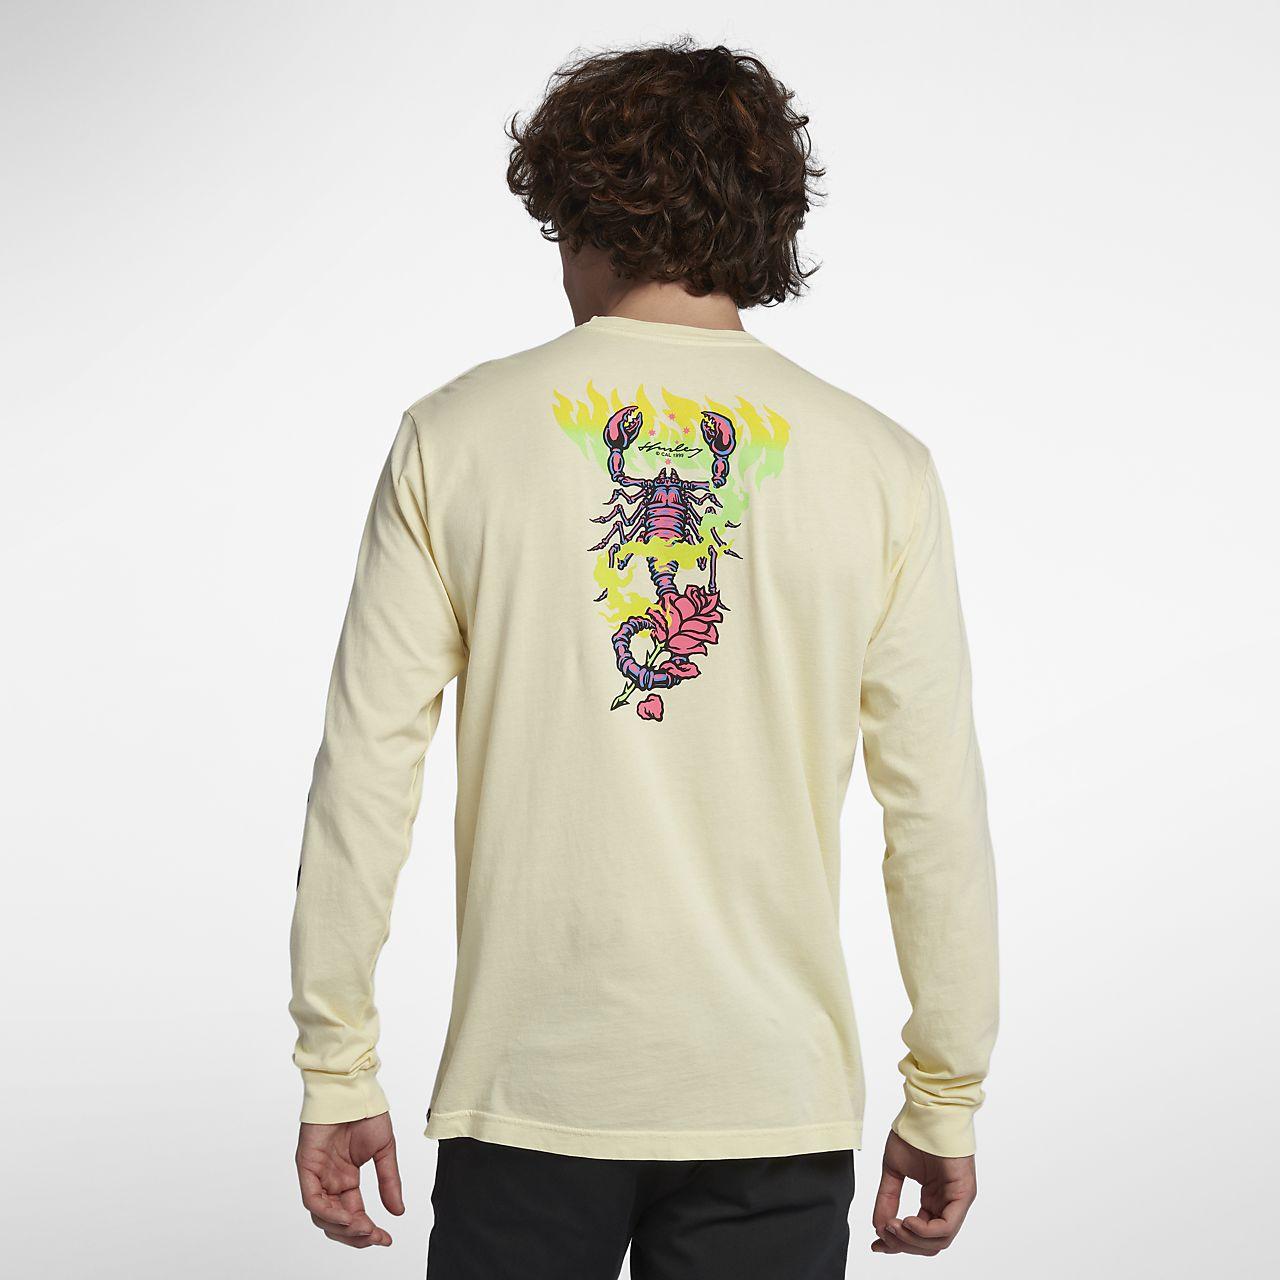 Мужская футболка с длинным рукавом Hurley Team Wilson